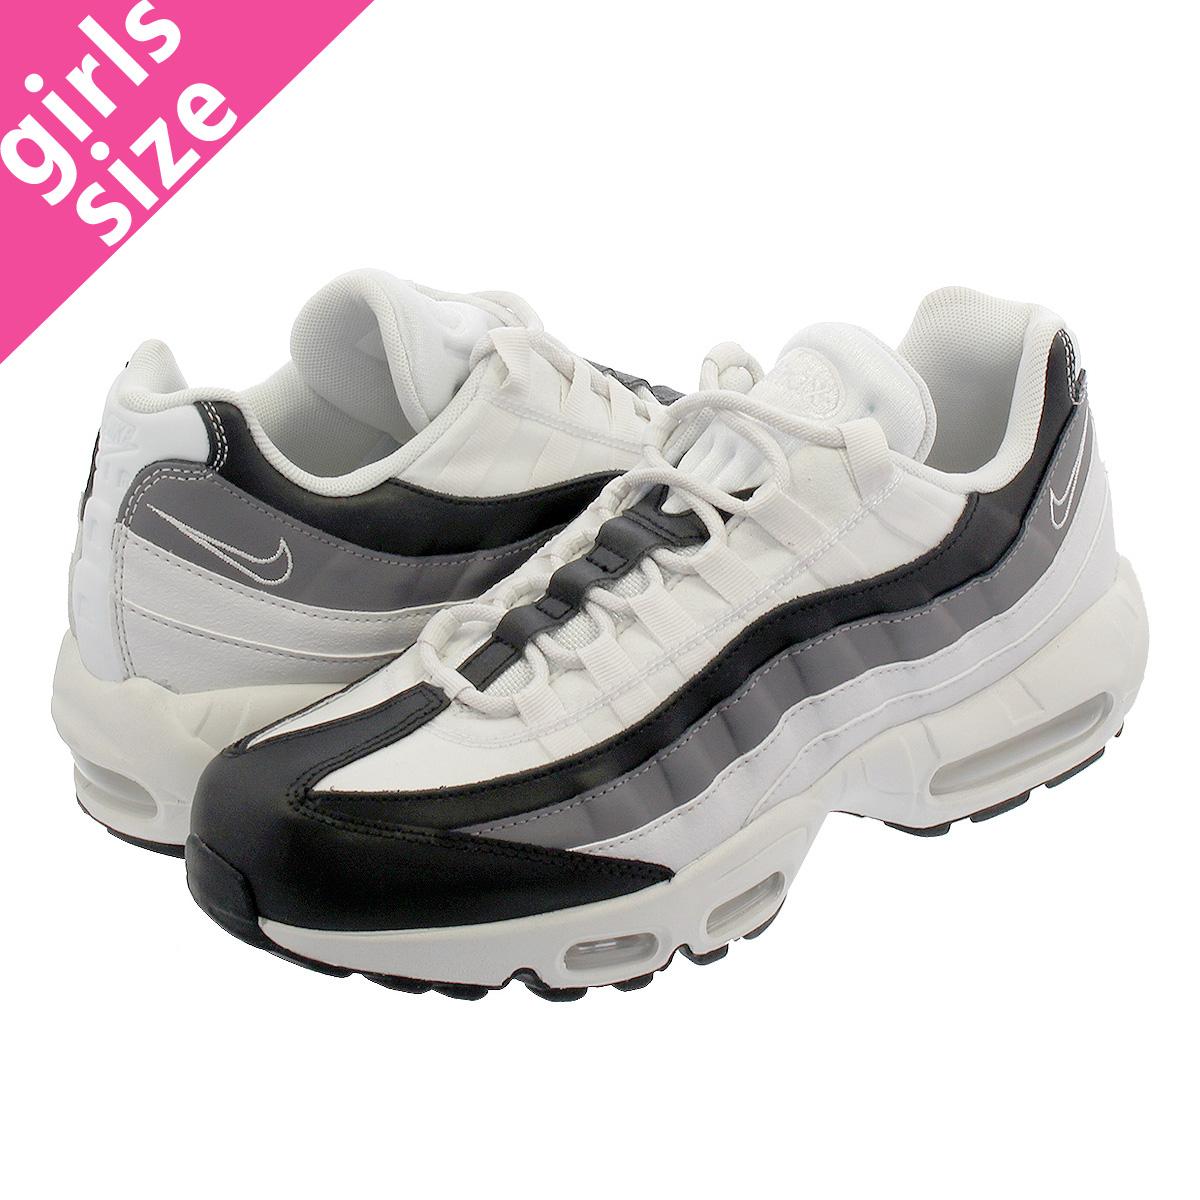 2018 Sale Outlet Schuhe NIKE Air Max 95 307960 017 Black